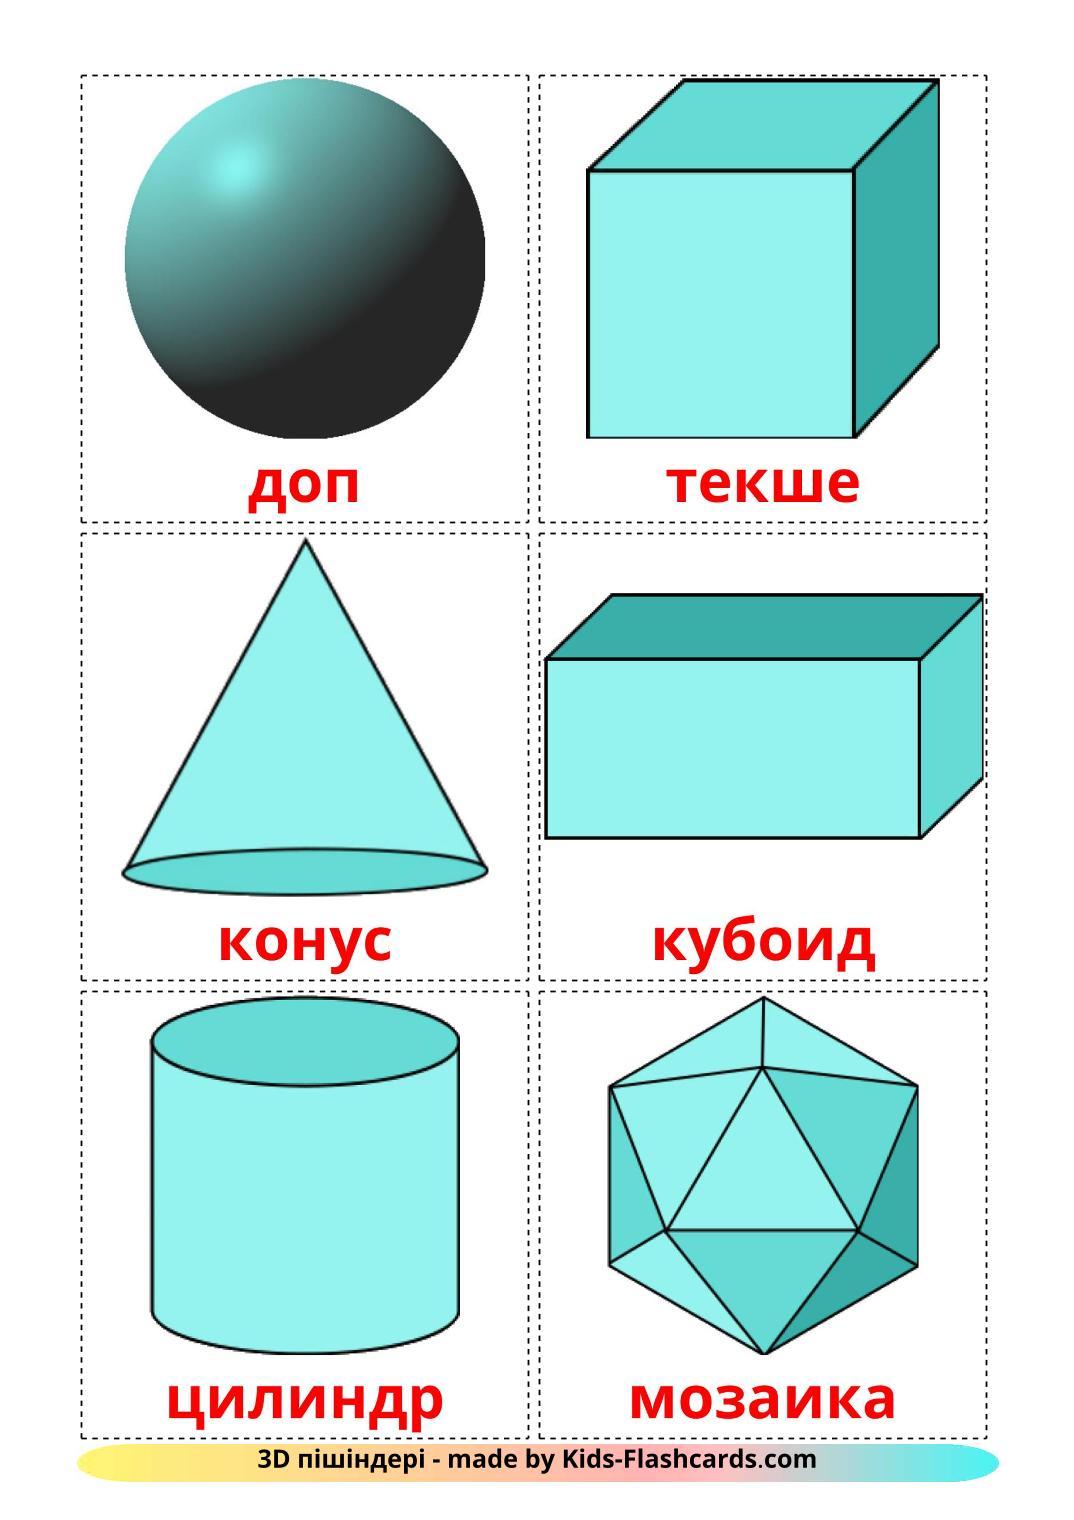 3D Shapes - 17 Free Printable kazakh Flashcards